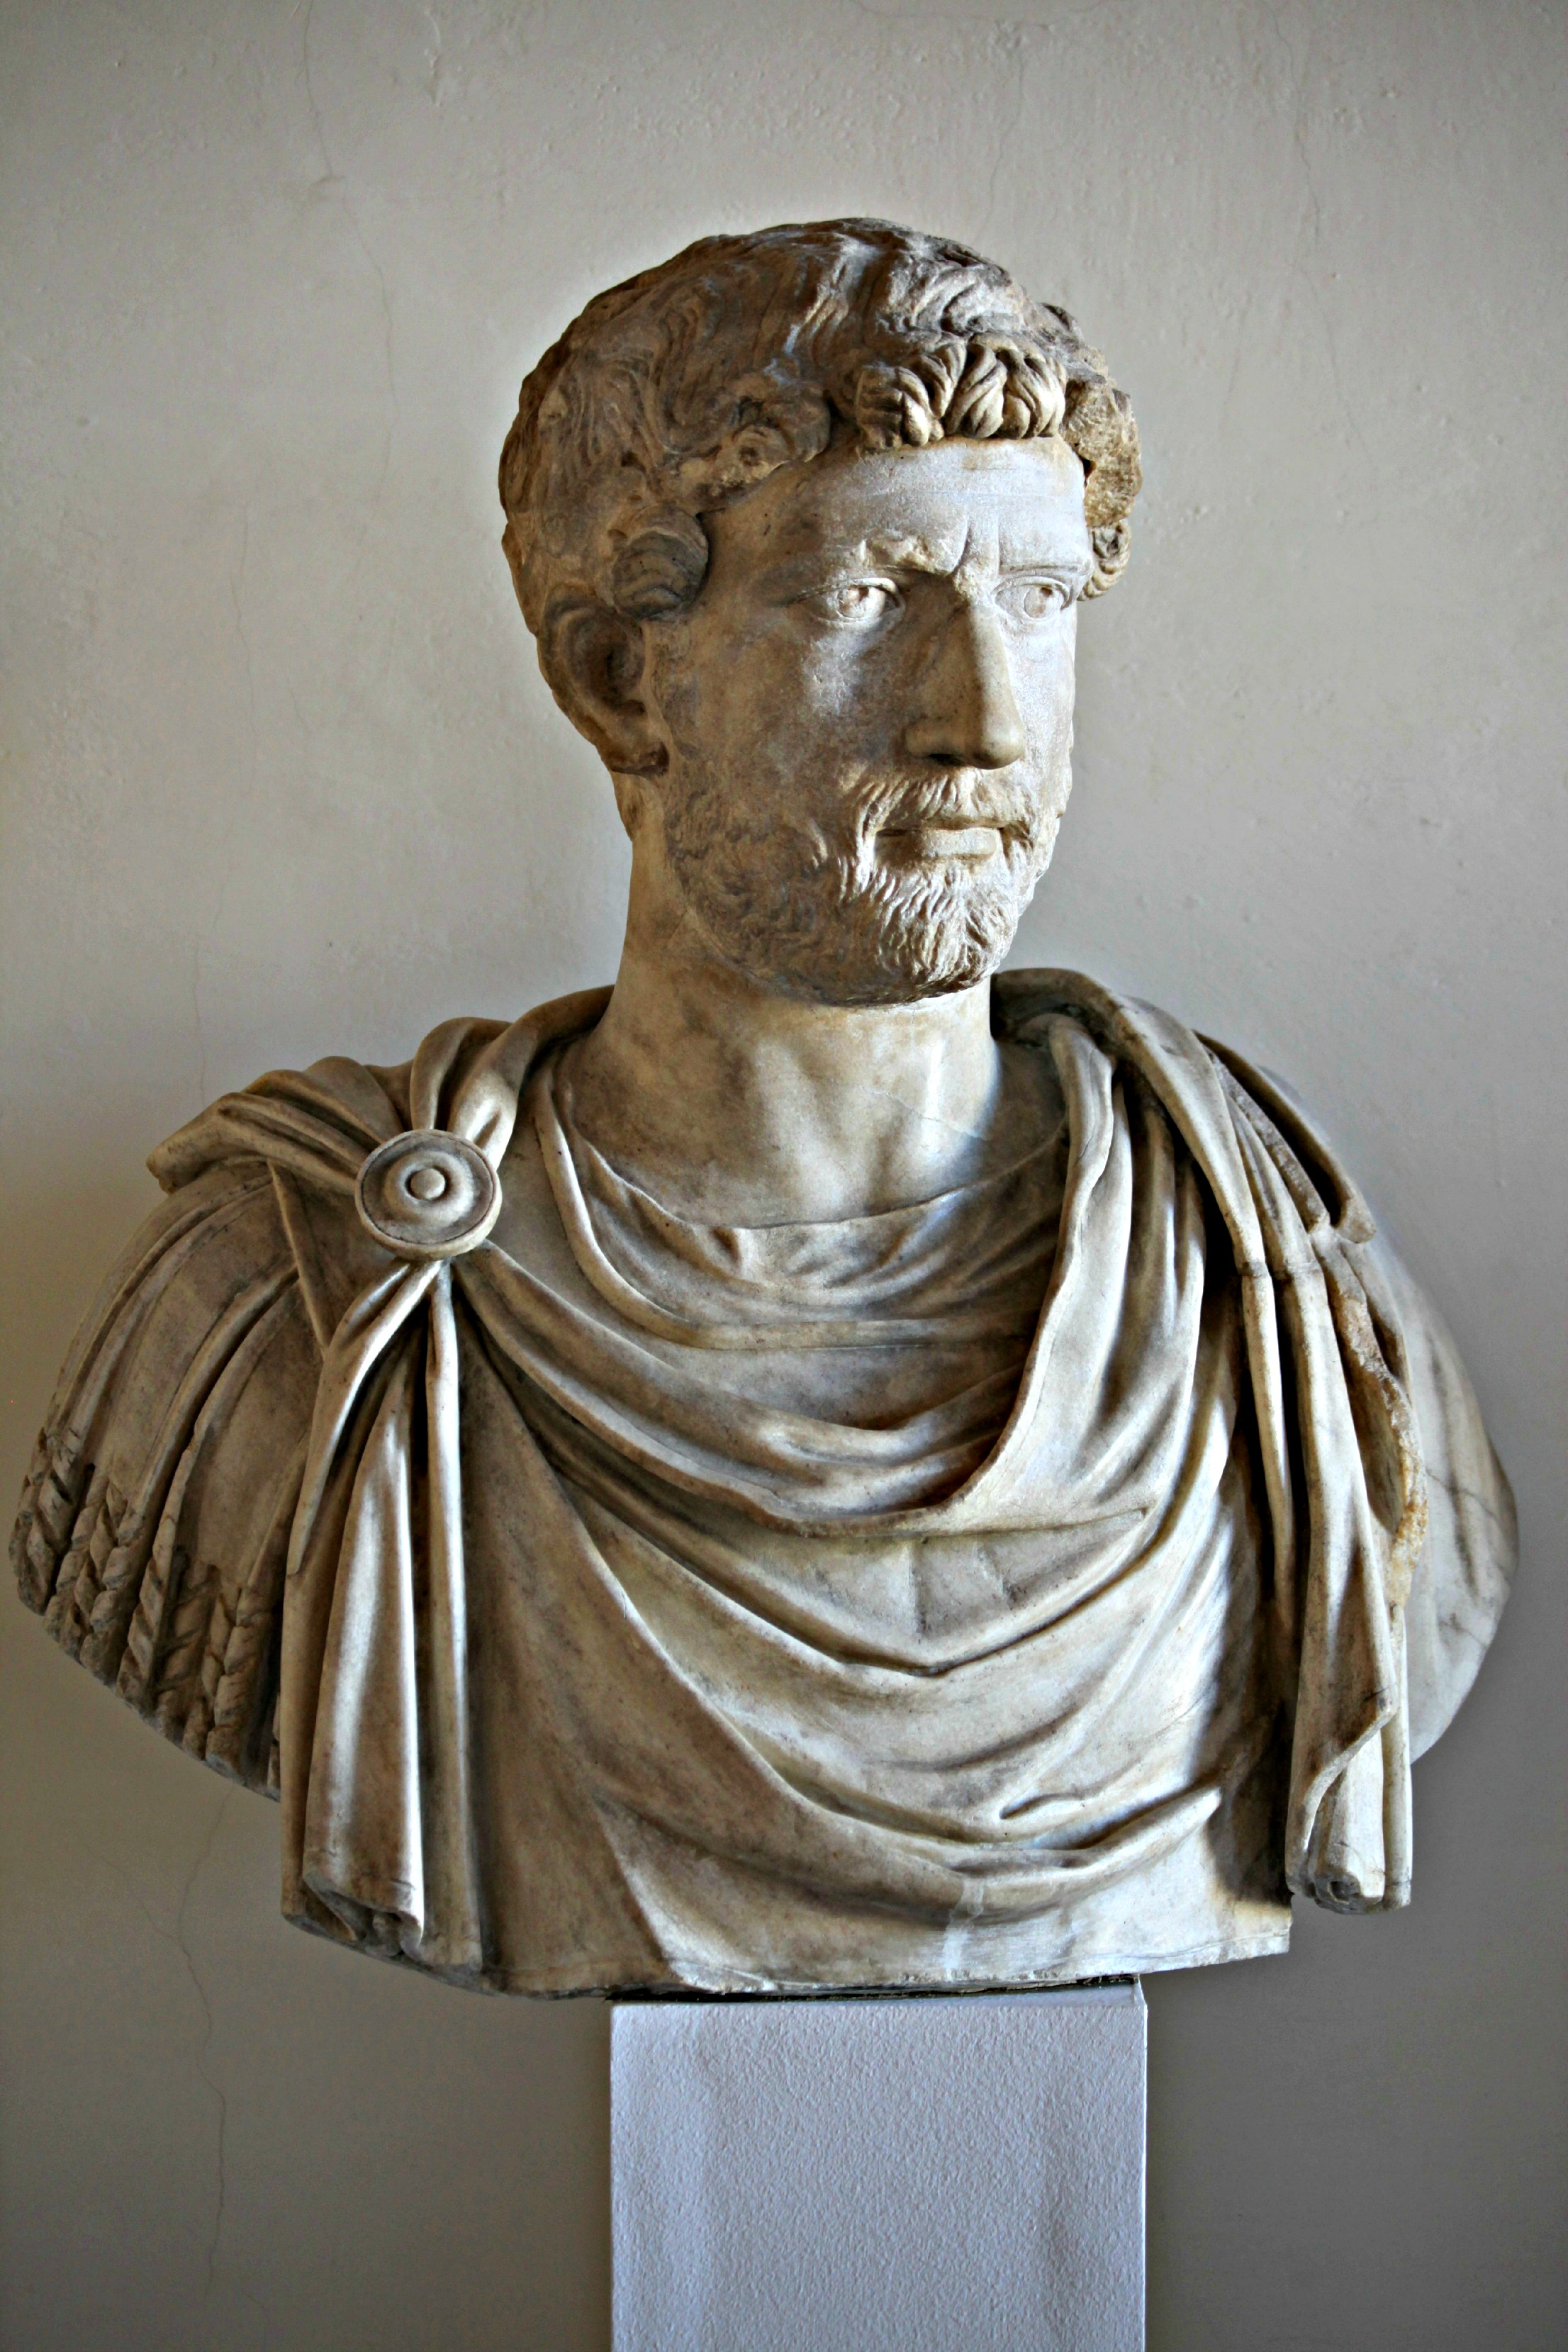 https://upload.wikimedia.org/wikipedia/commons/d/d2/Ritratto_di_adriano_138_d_c.JPG